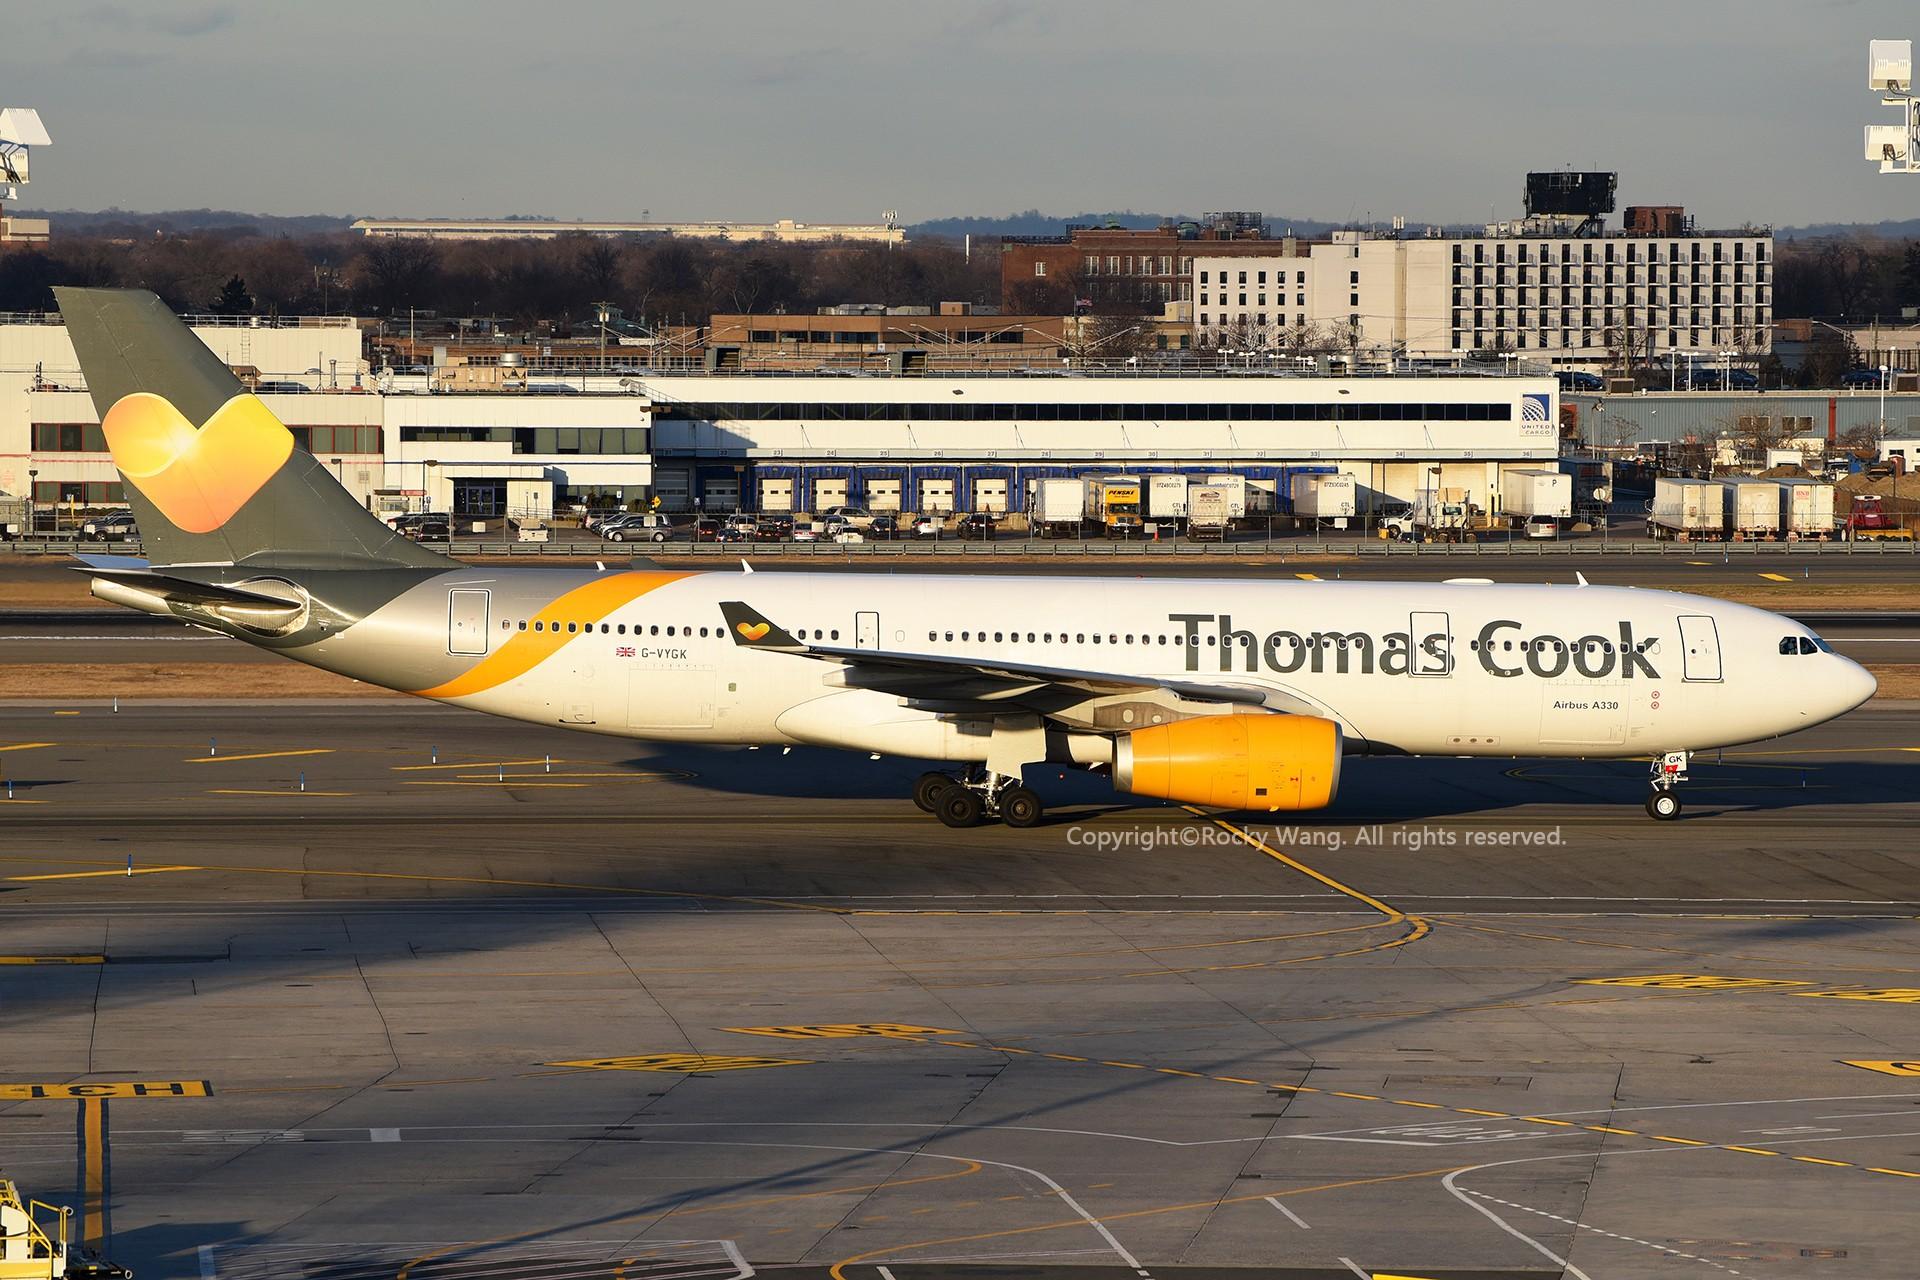 Re:[原创]A330s Around the World AIRBUS A330-243 C-VYGK 美国纽约约翰·菲茨杰拉德·肯尼迪国际机场